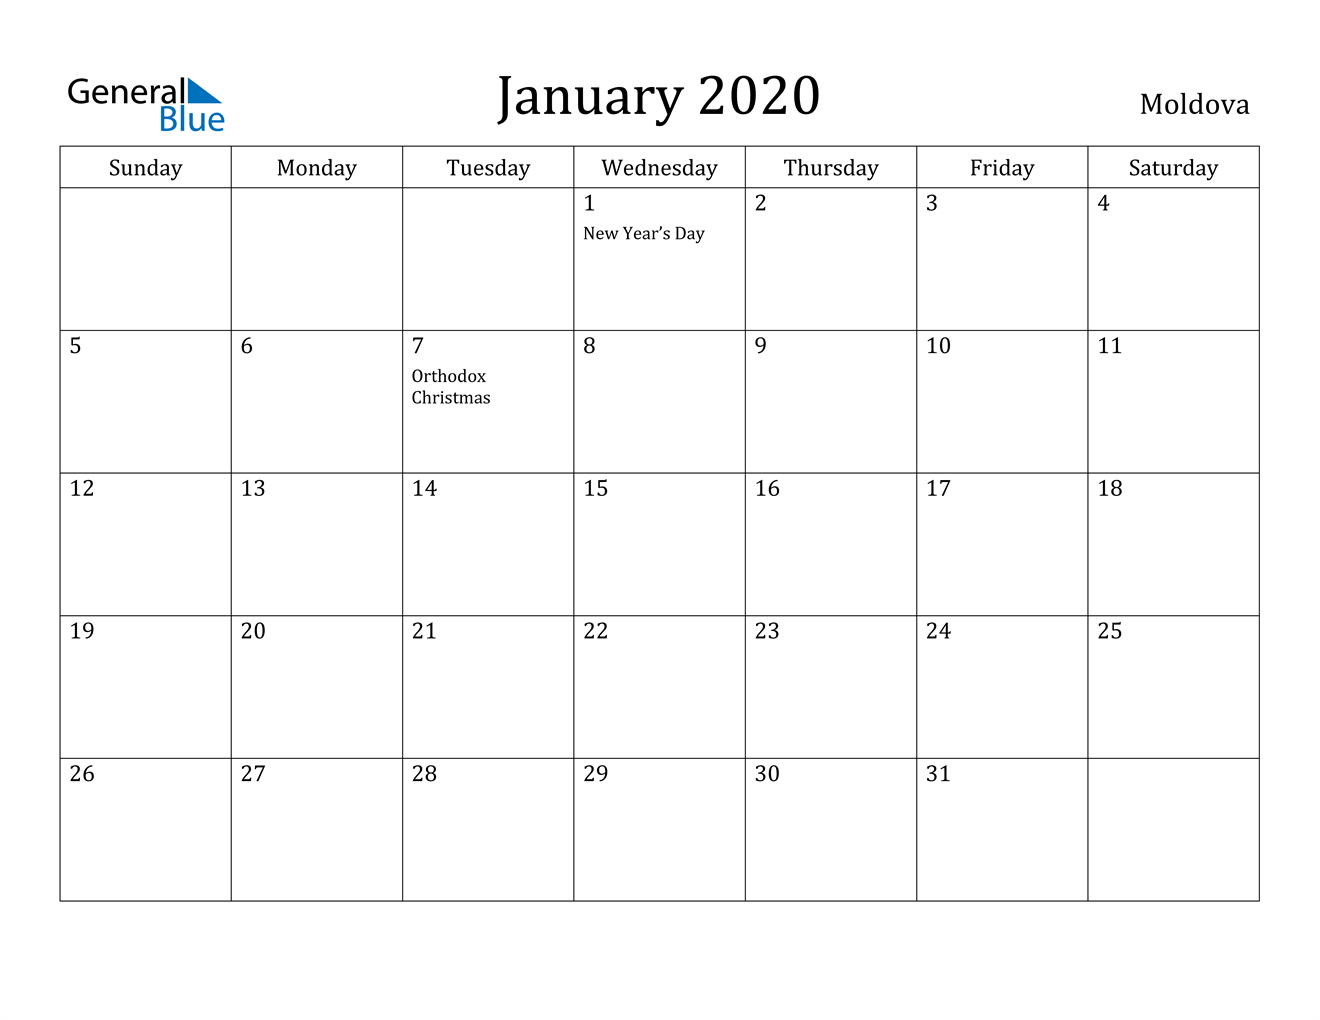 Image of January 2020 Moldova Calendar with Holidays Calendar